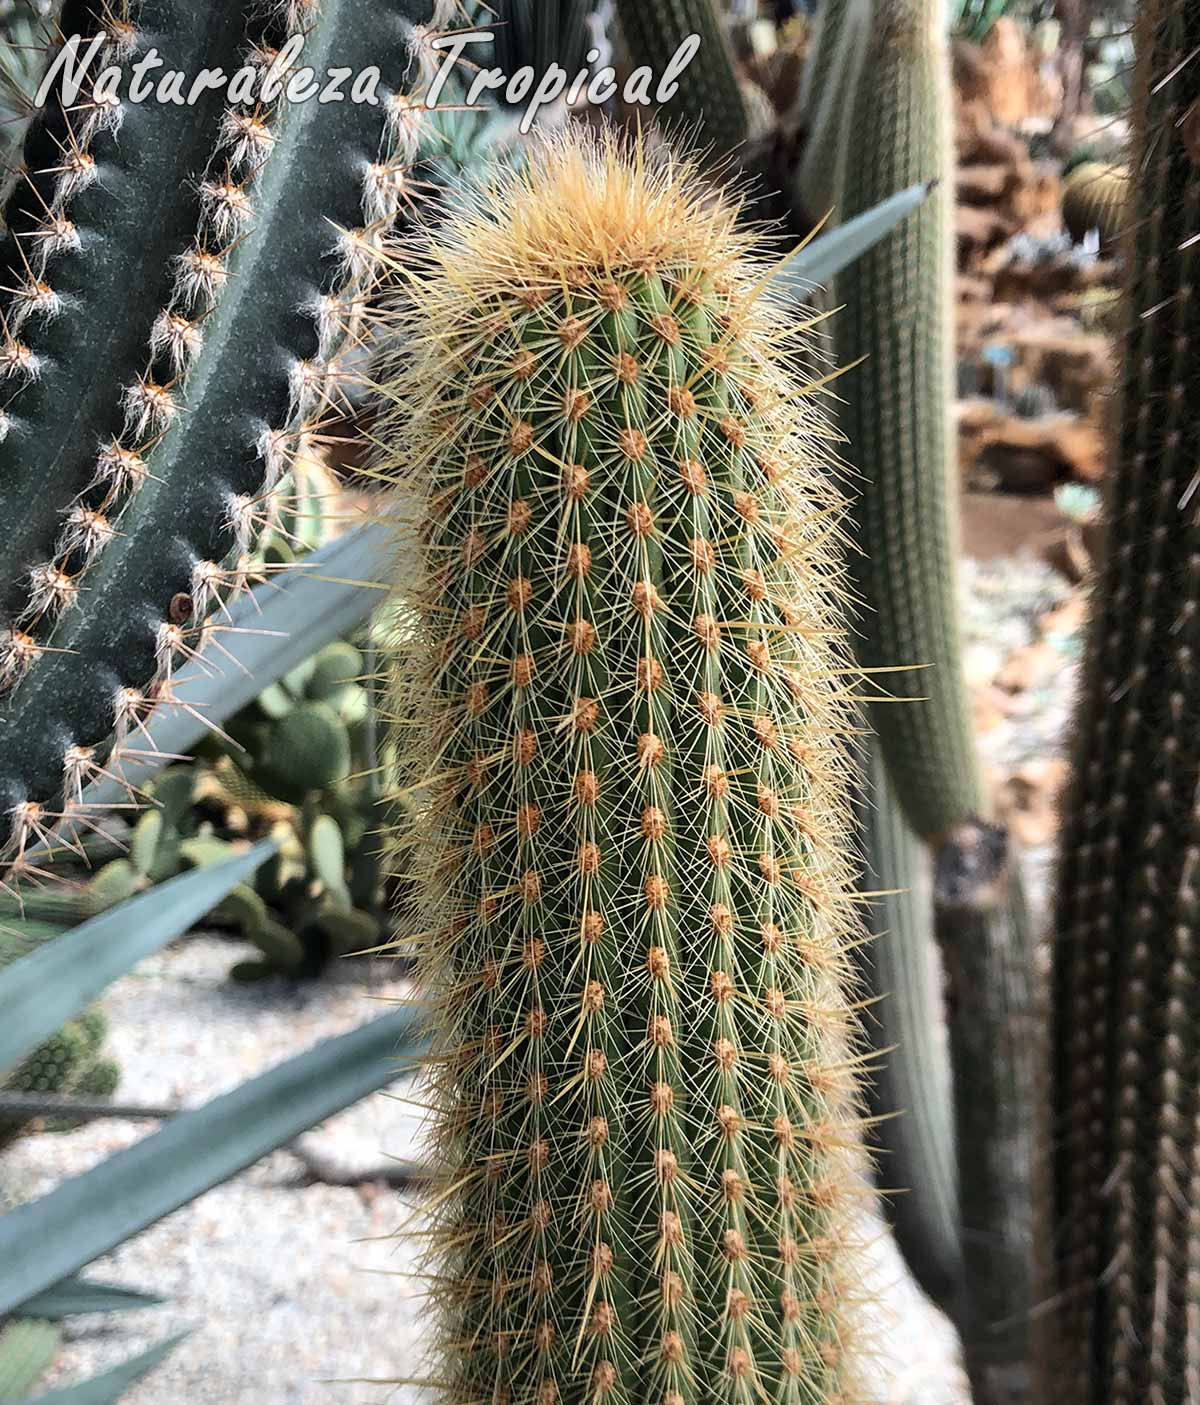 Vista del tallo característico del cactus Espostoa guentheri